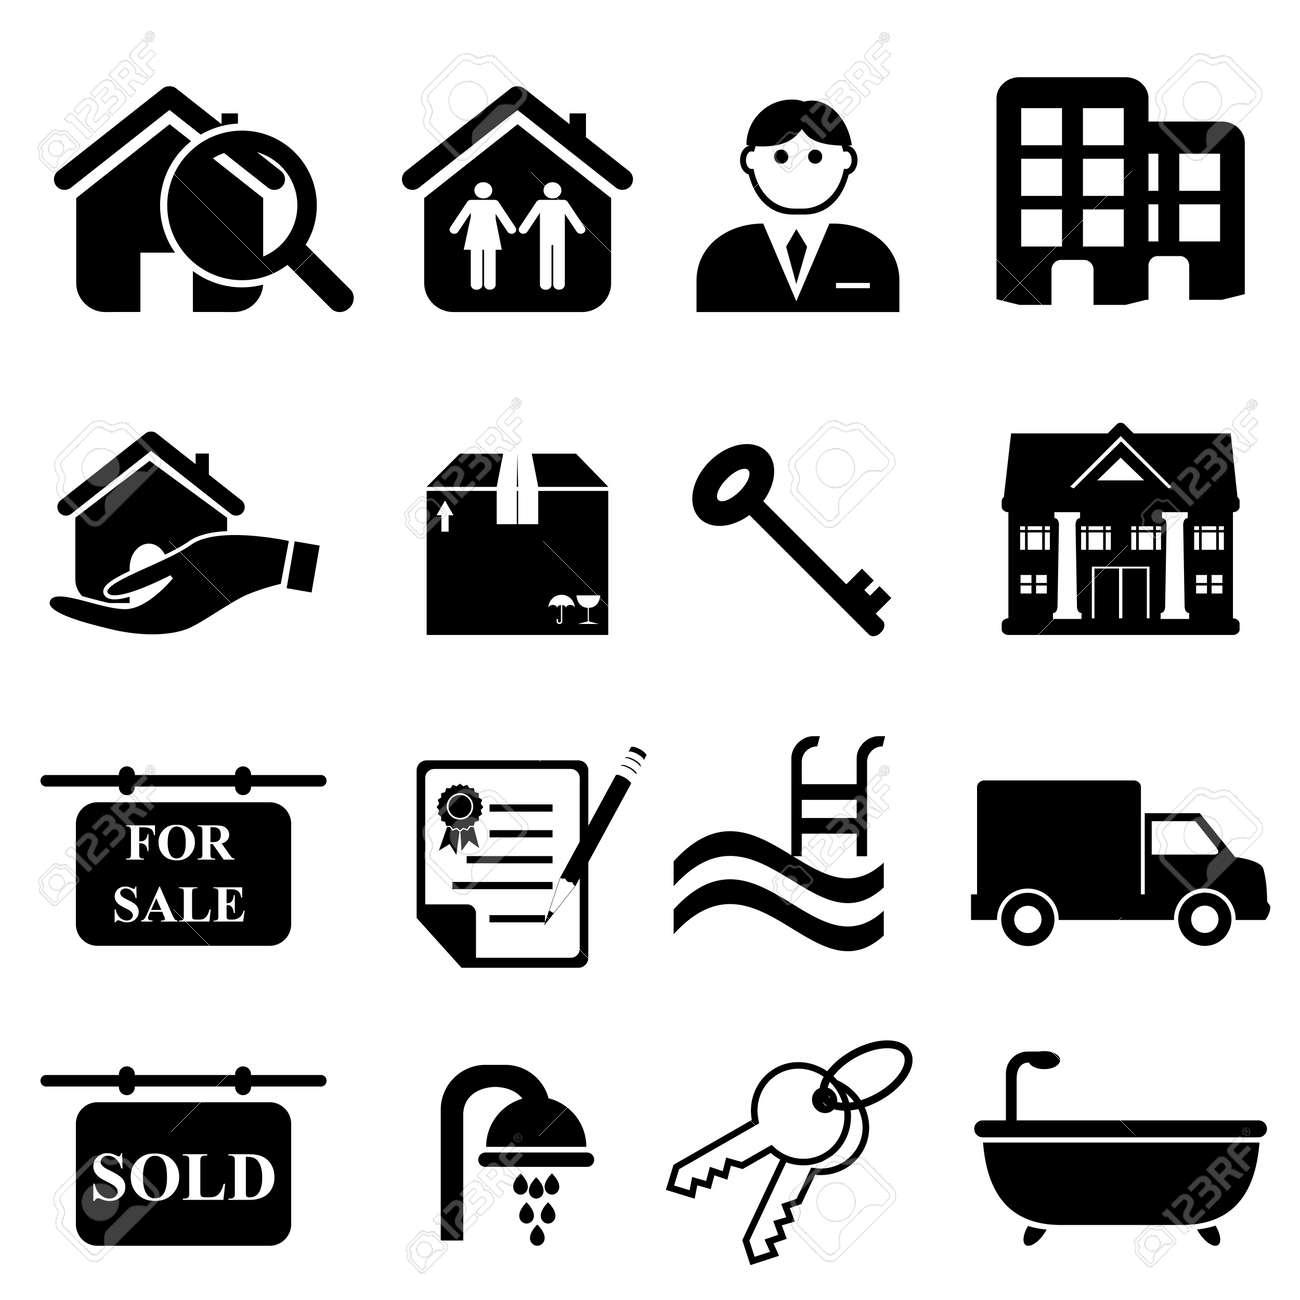 Real estate icon set in black Stock Vector - 15663431